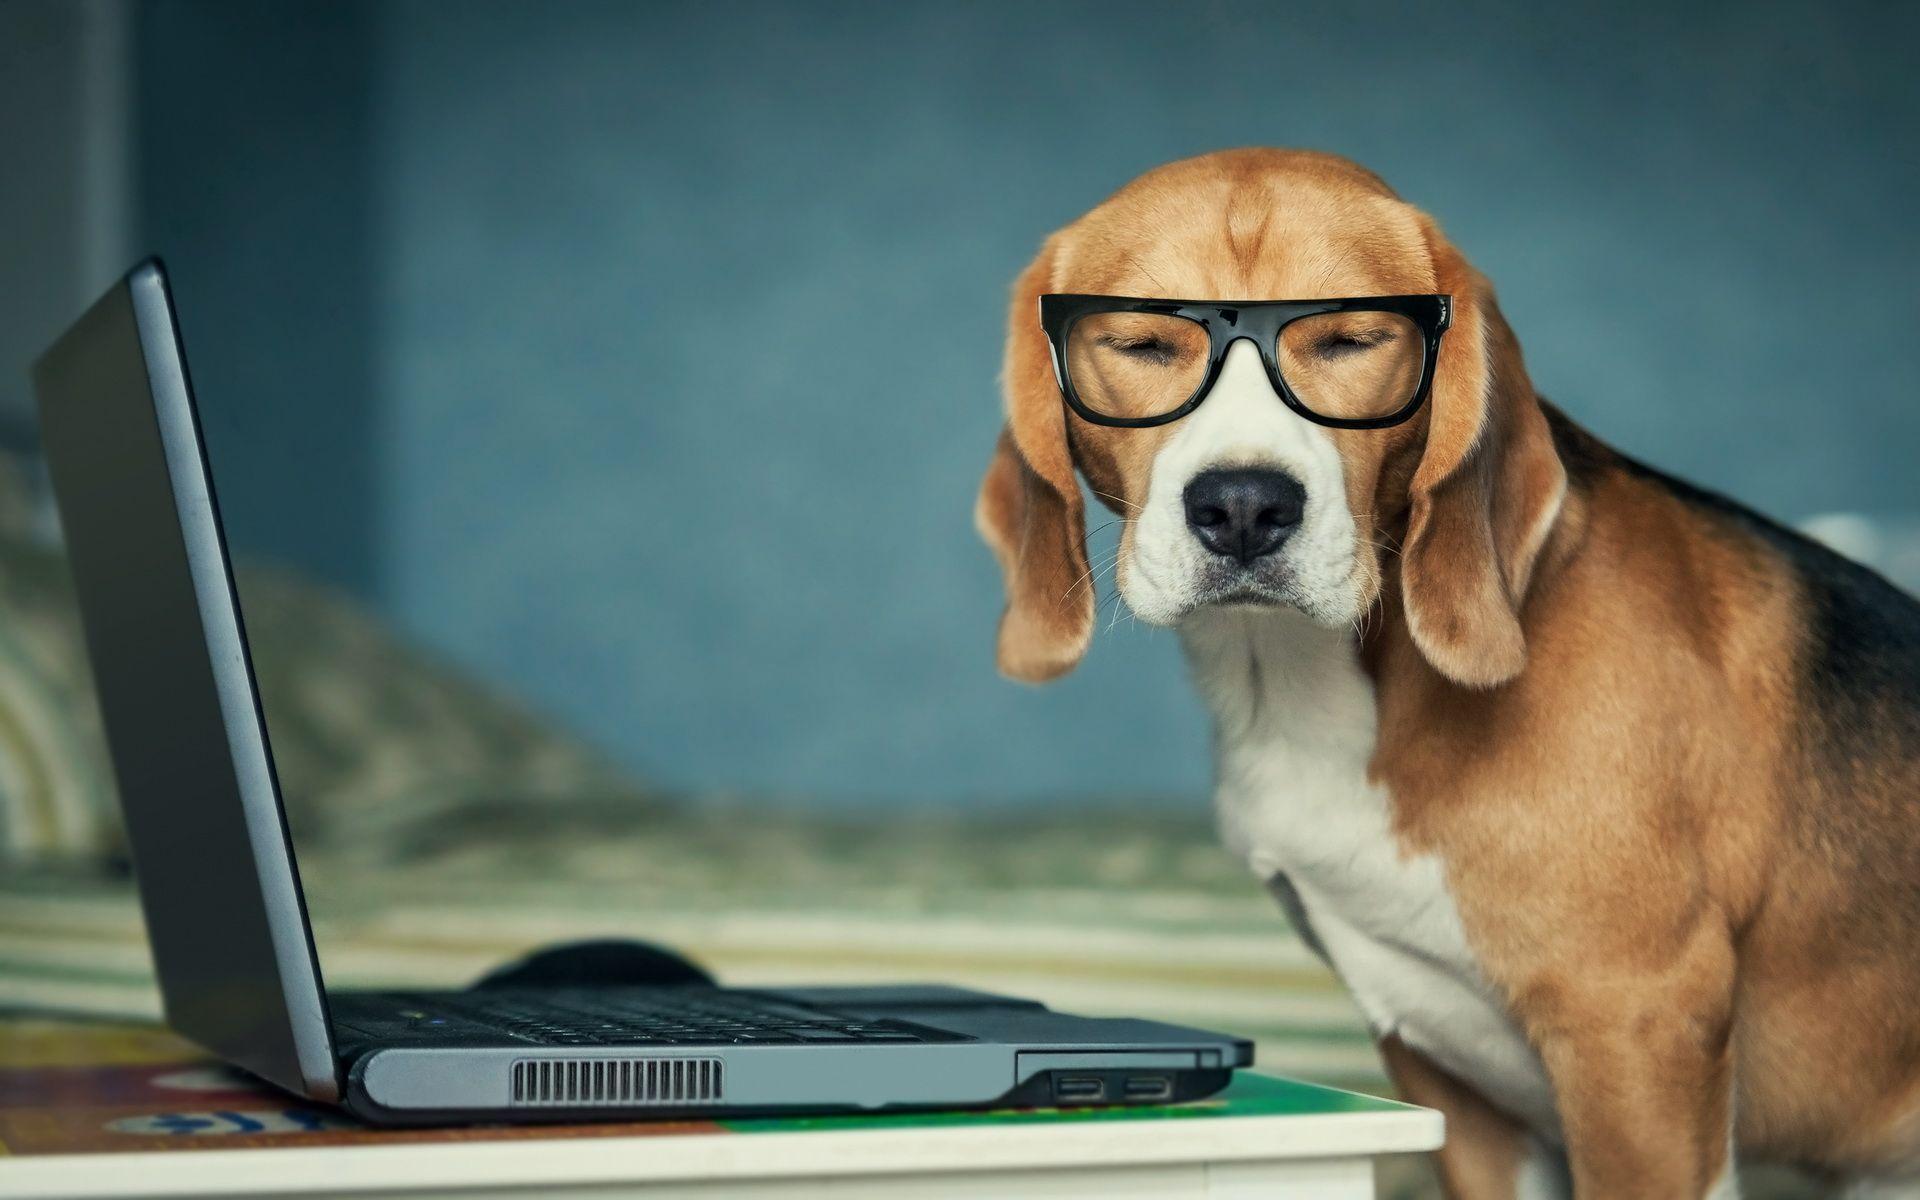 Beagle cute animals dogs pinterest beagle beagle breeds and dog